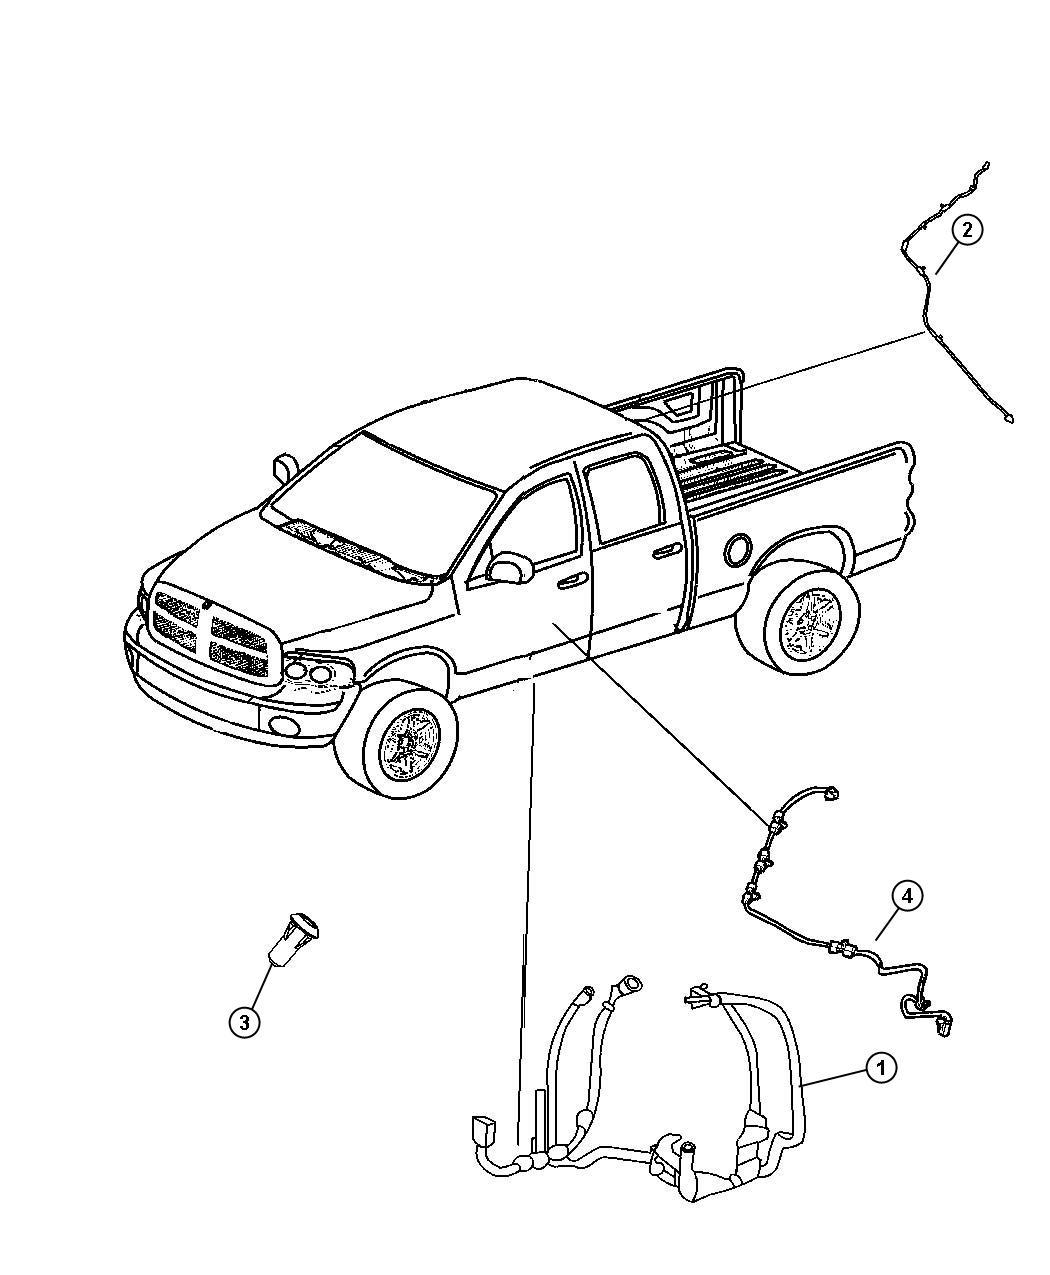 Dodge Ram 3500 Wiring. Body. [[heated second row seats